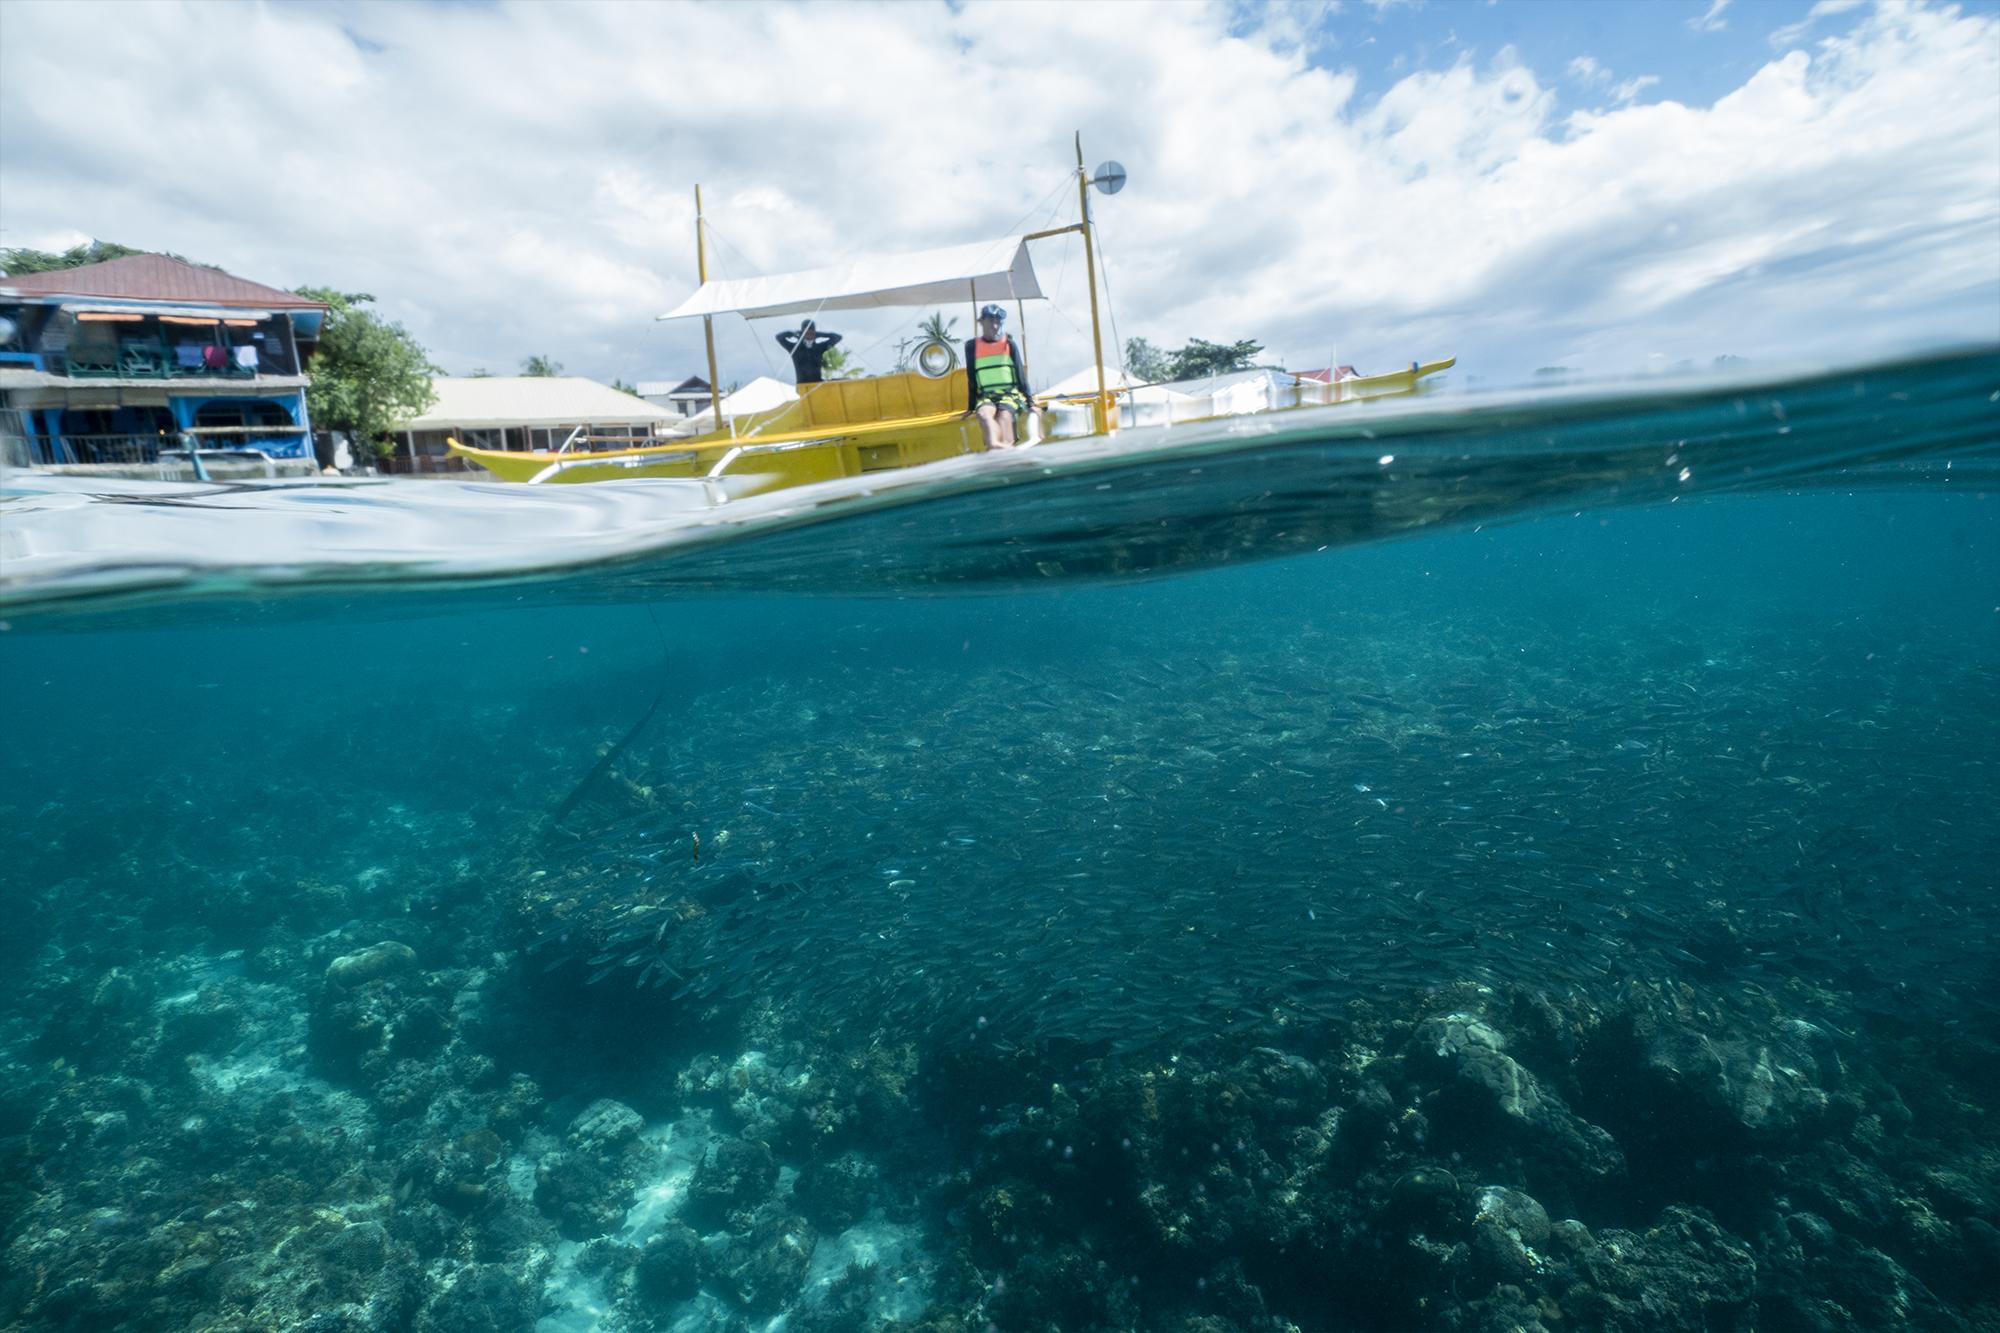 Sardines-MoalBoal-cebu-snorkeling-hobo-life-hoang